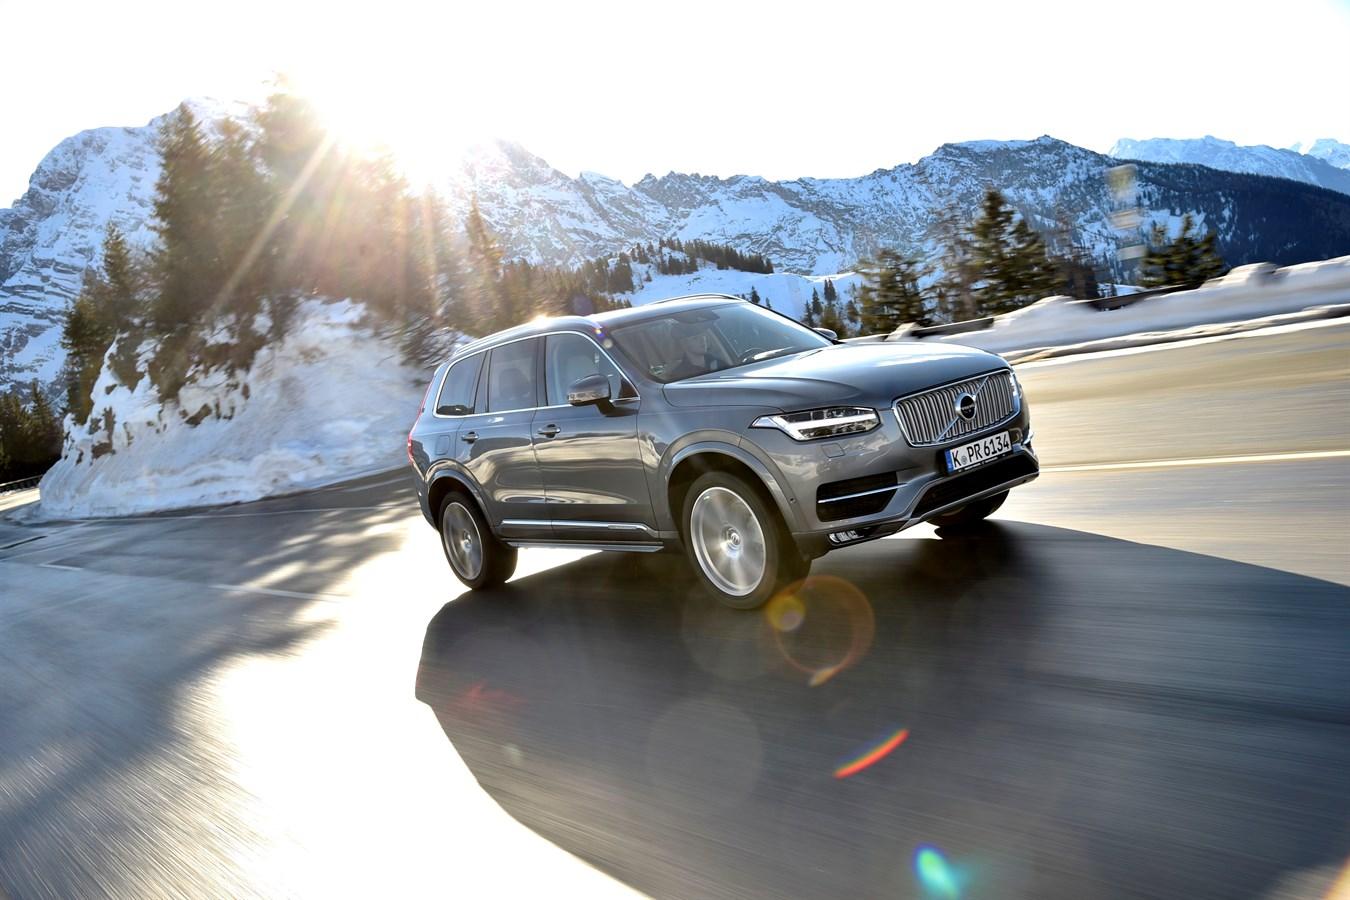 Volvo XC90 T5 Inscription AWD - model year 2017